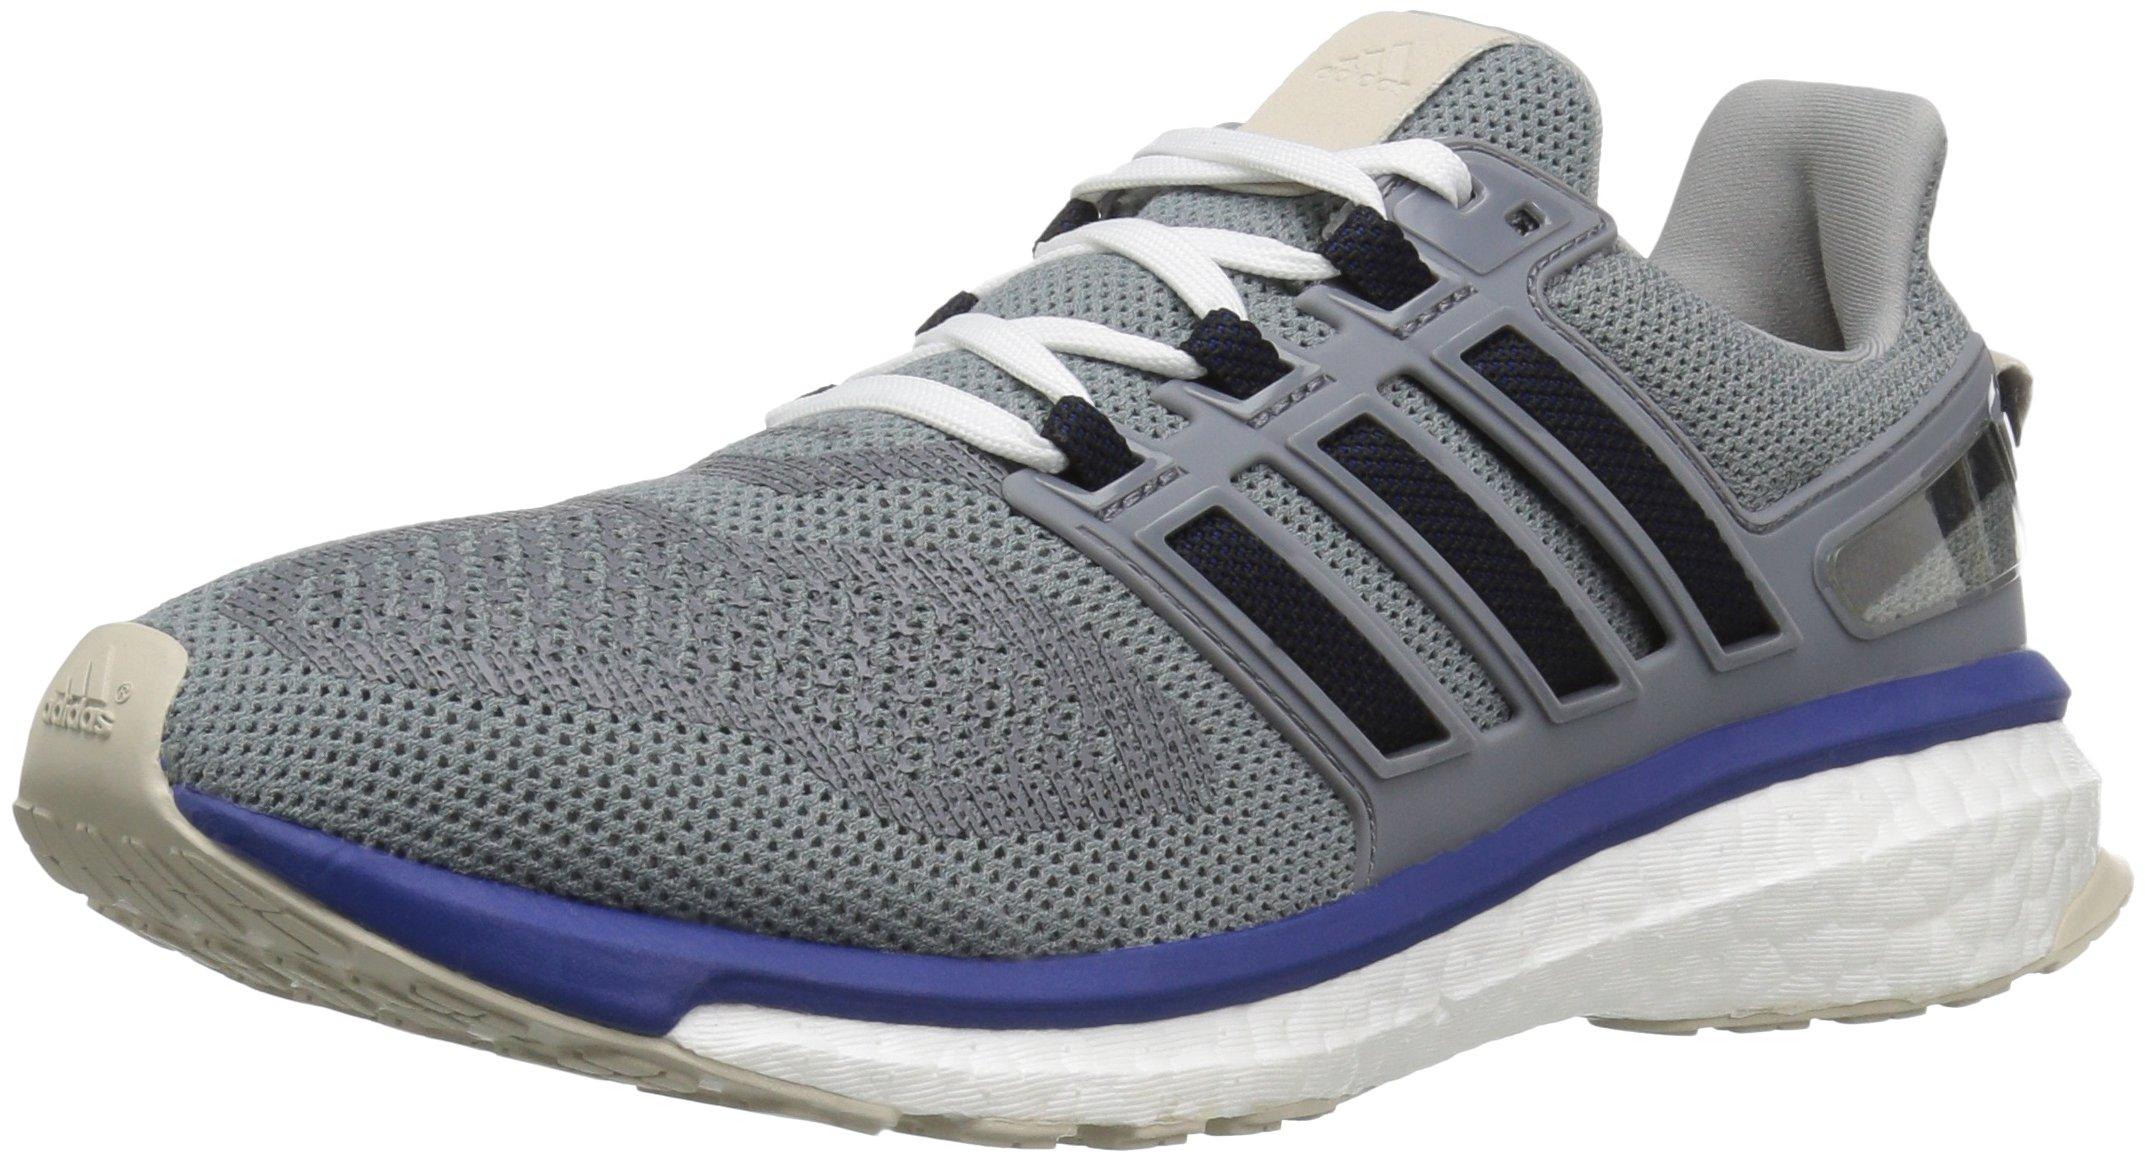 4581d2875e8 Galleon - Adidas Performance Men s Energy Boost 3 Running Shoe